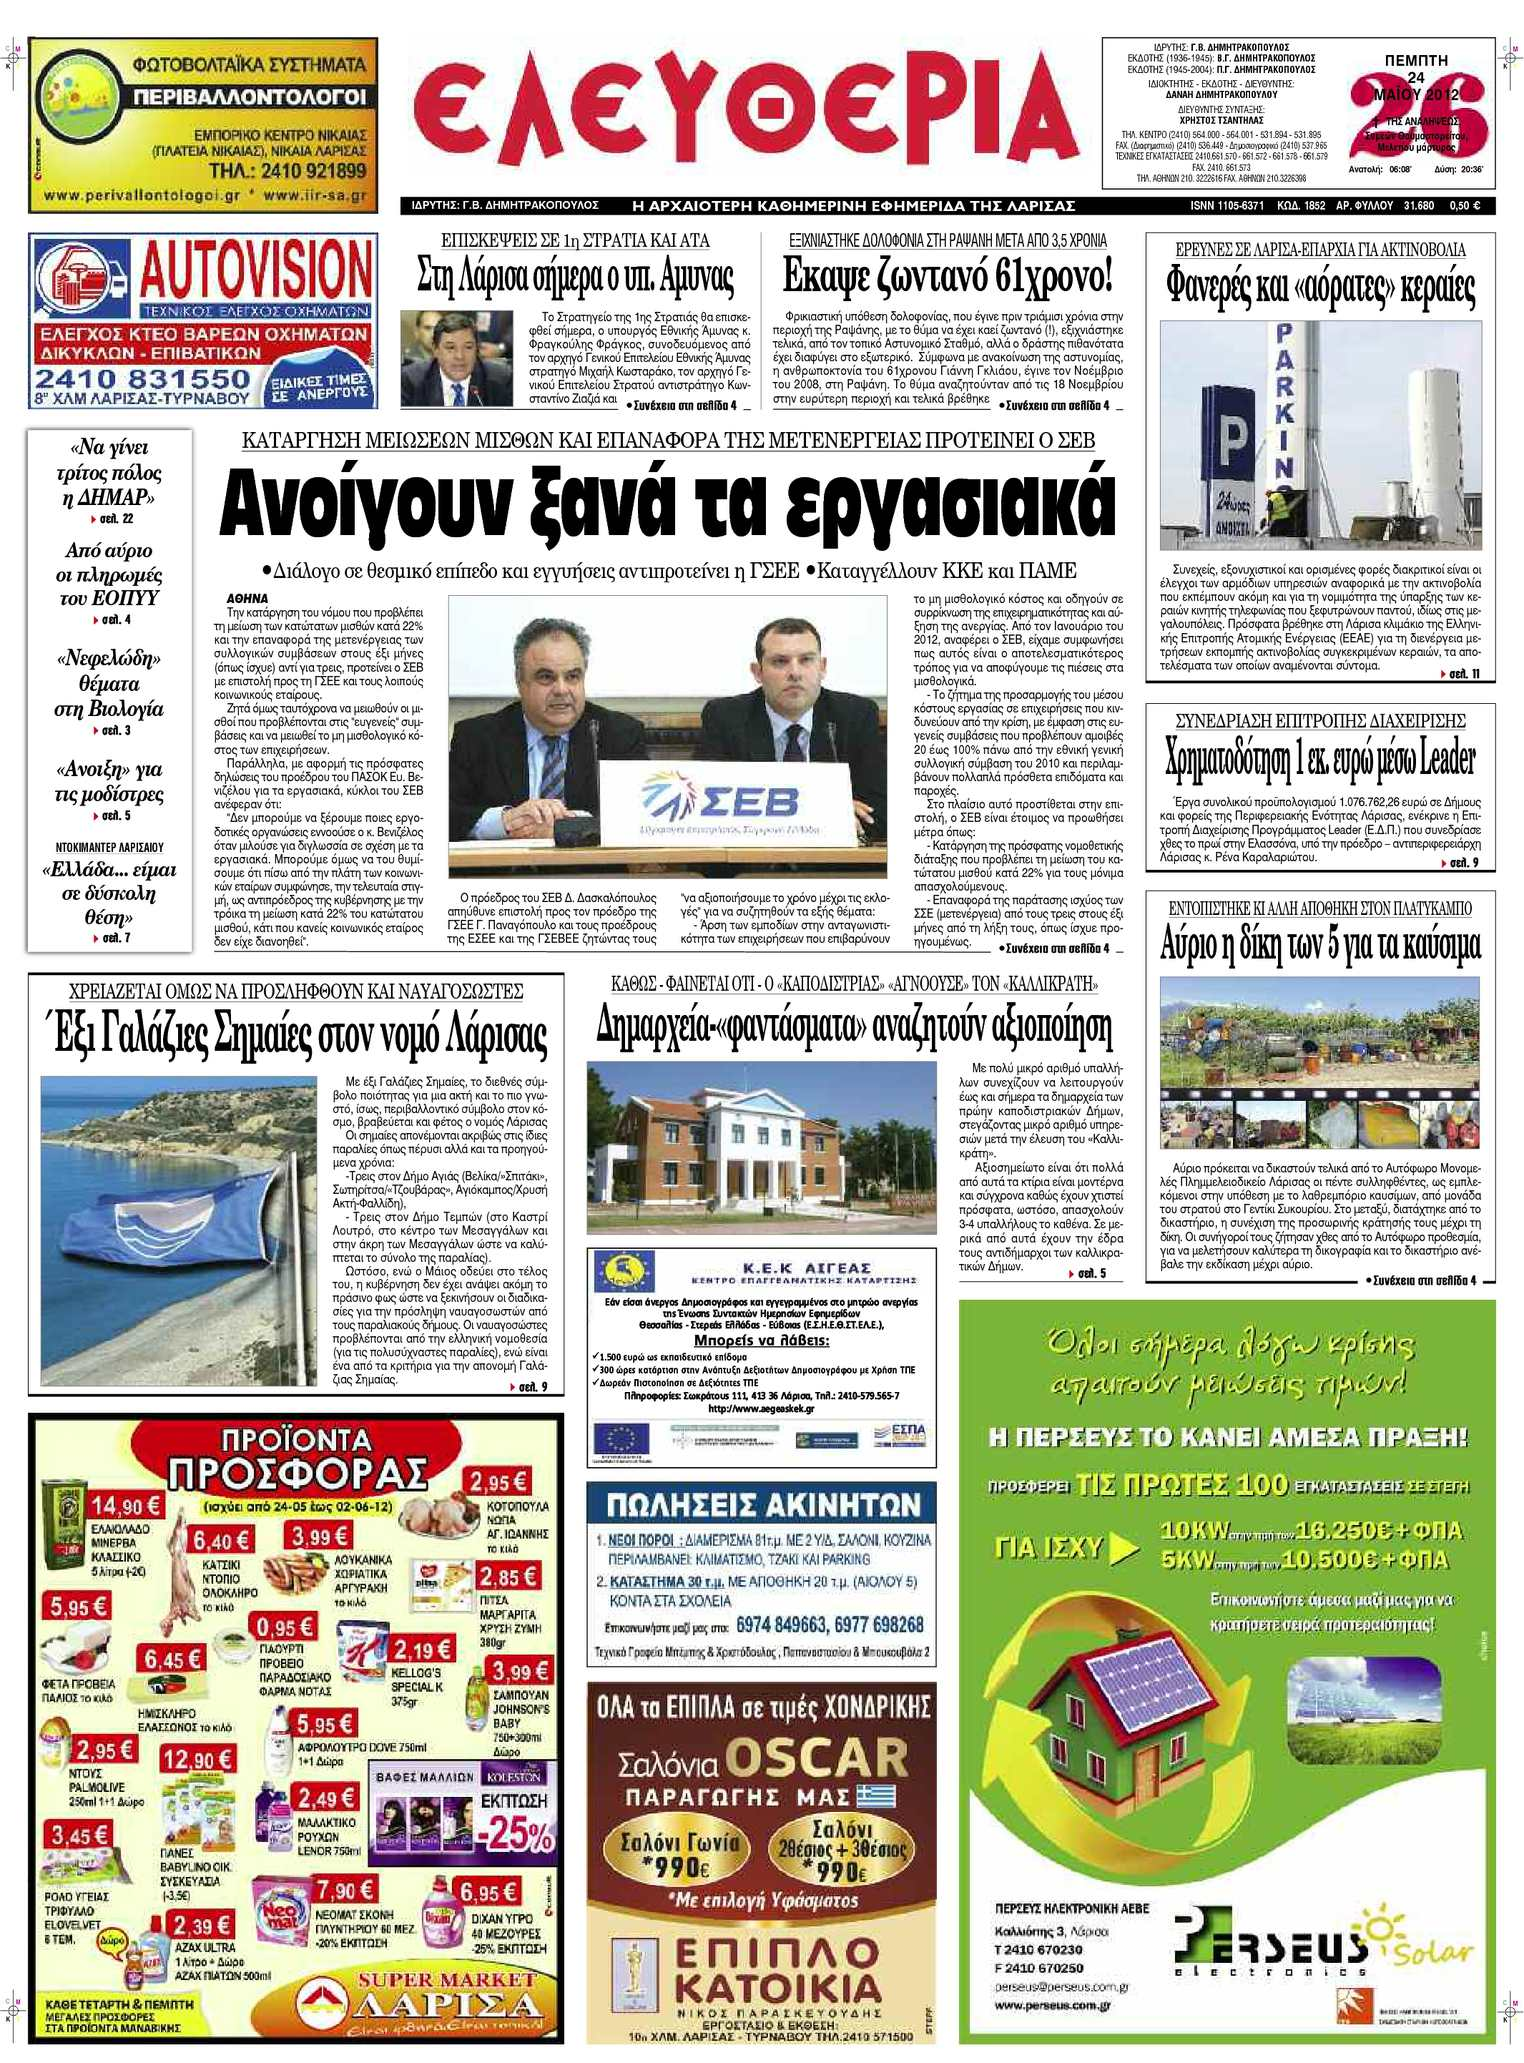 Calaméo - Eleftheria.gr 24 05 2012 54056130401